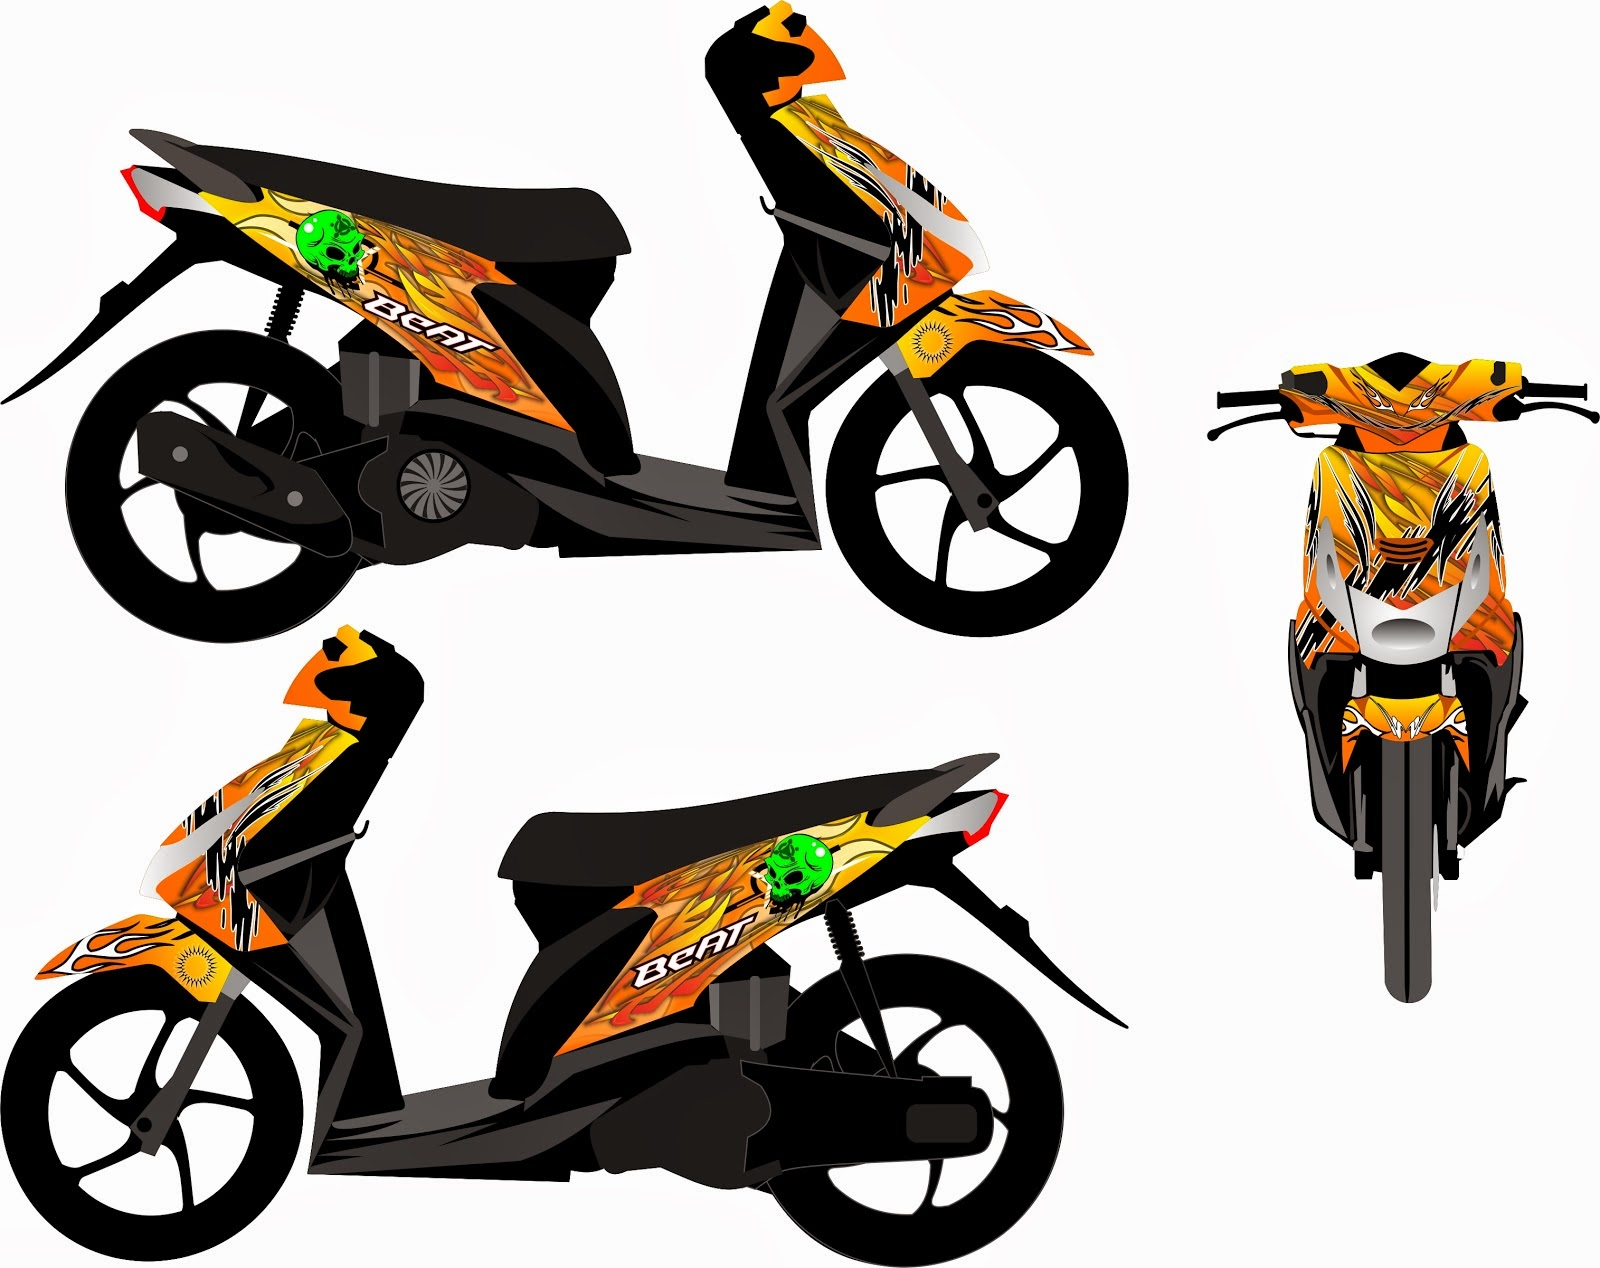 sablon, digital printing, branding motor: racing concept